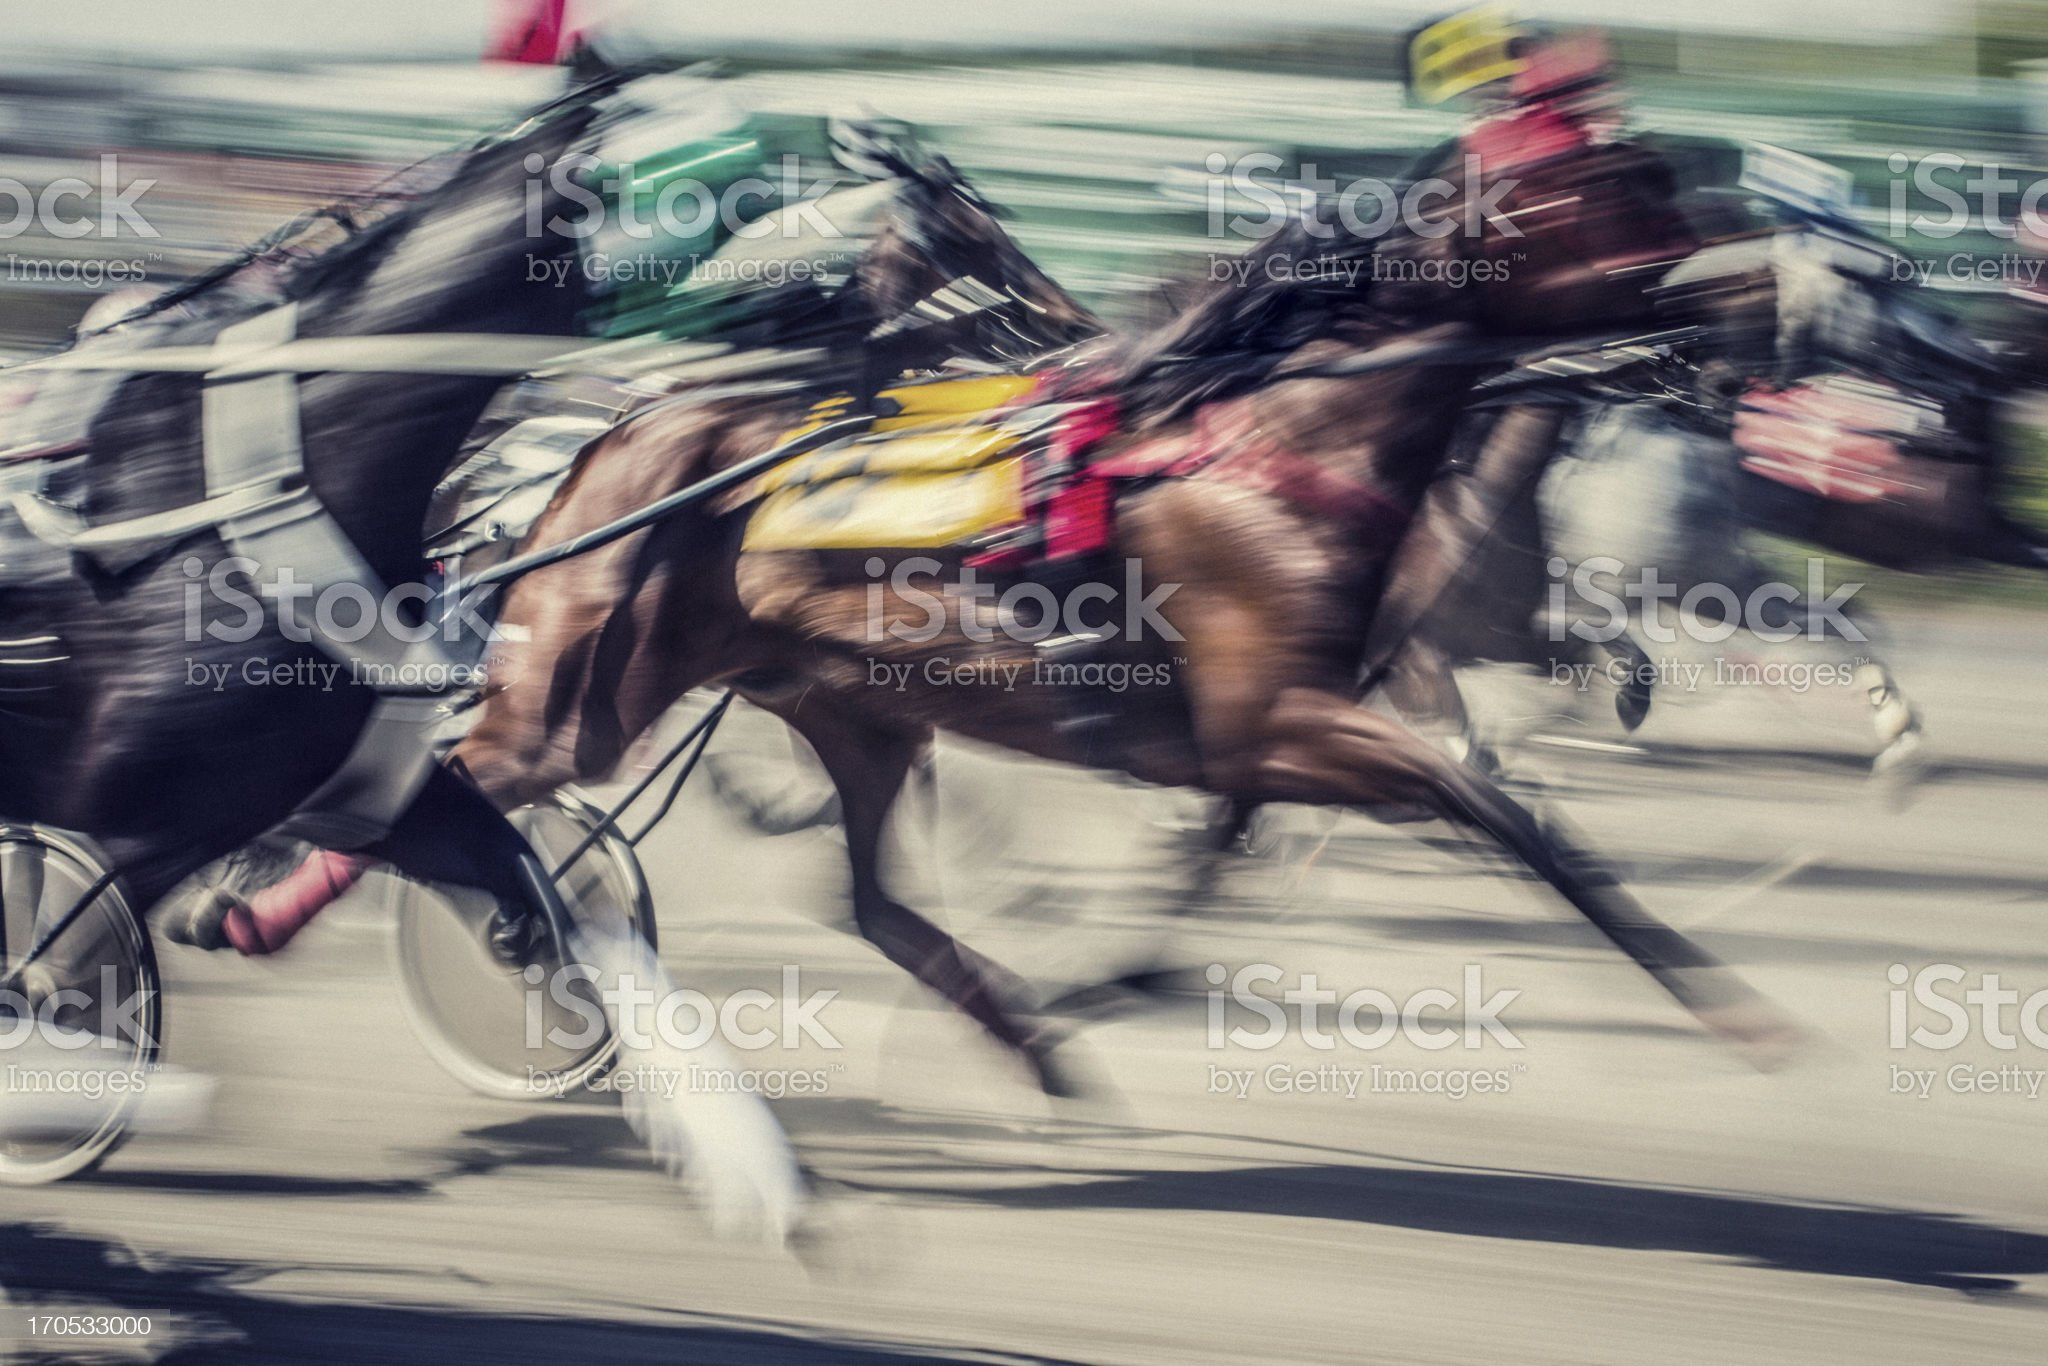 Horseracing royalty-free stock photo